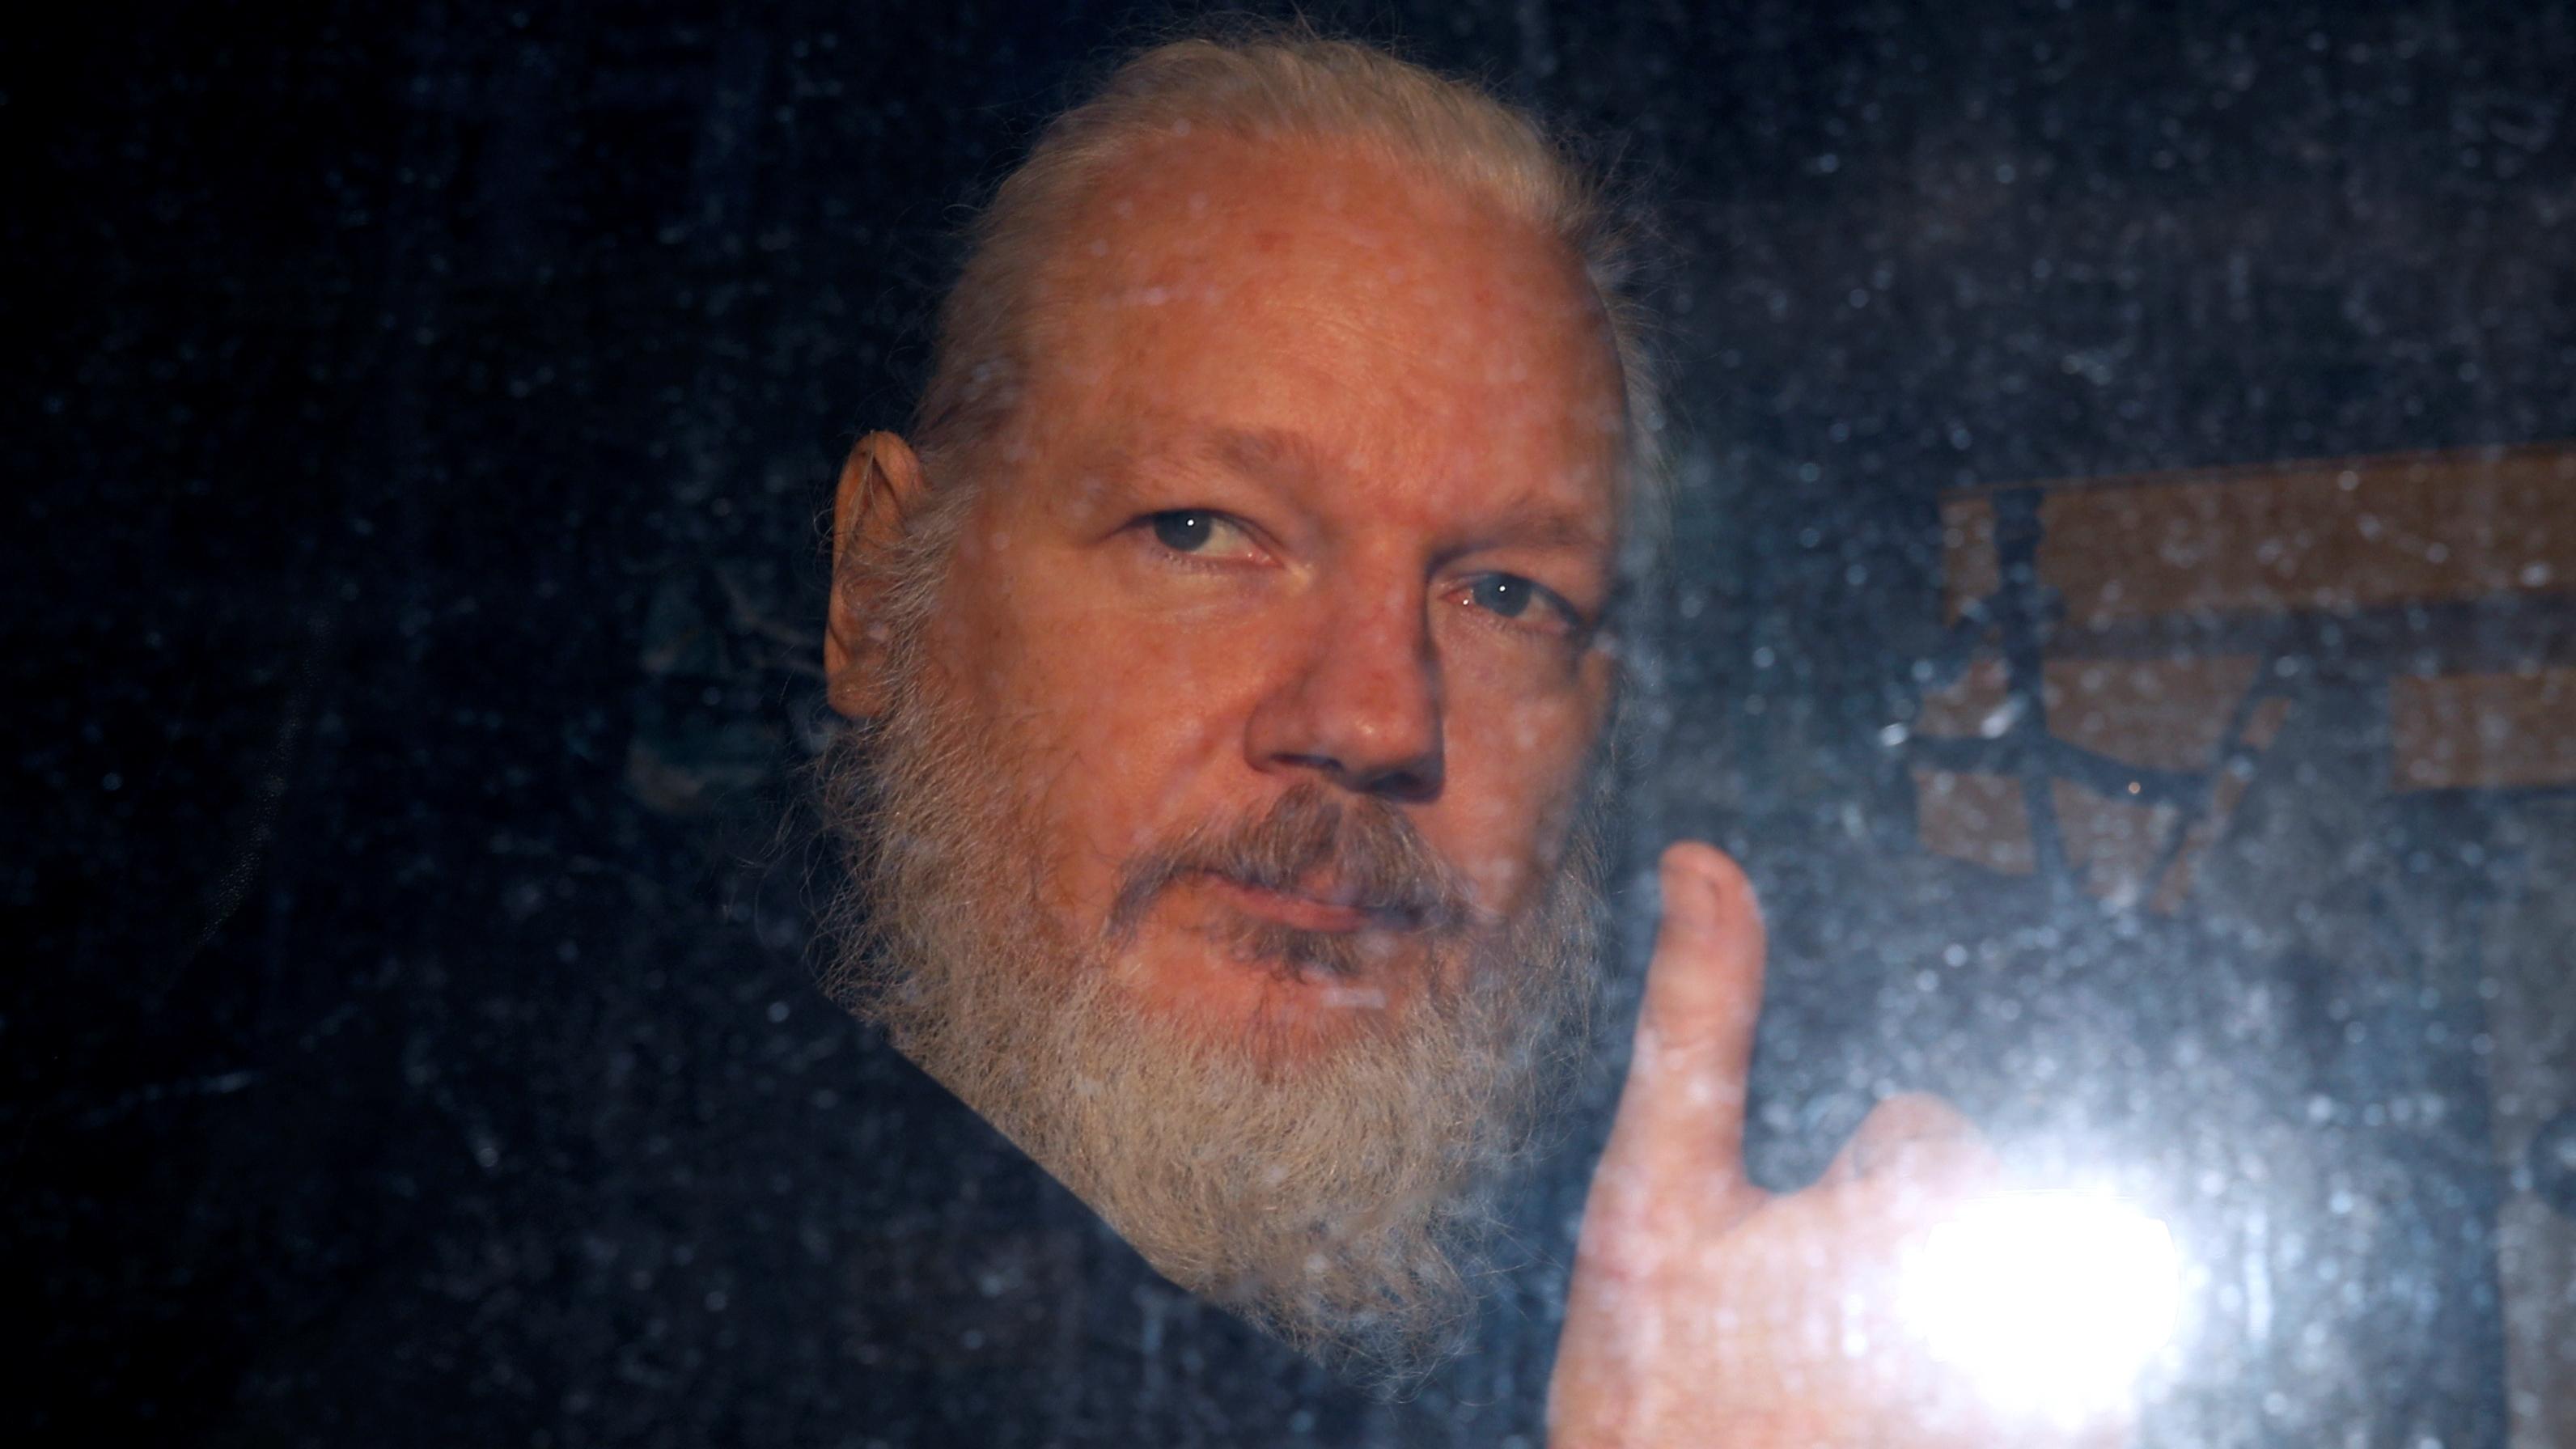 Tras detención de Assange en Londres, EU lo acusa de conspiración